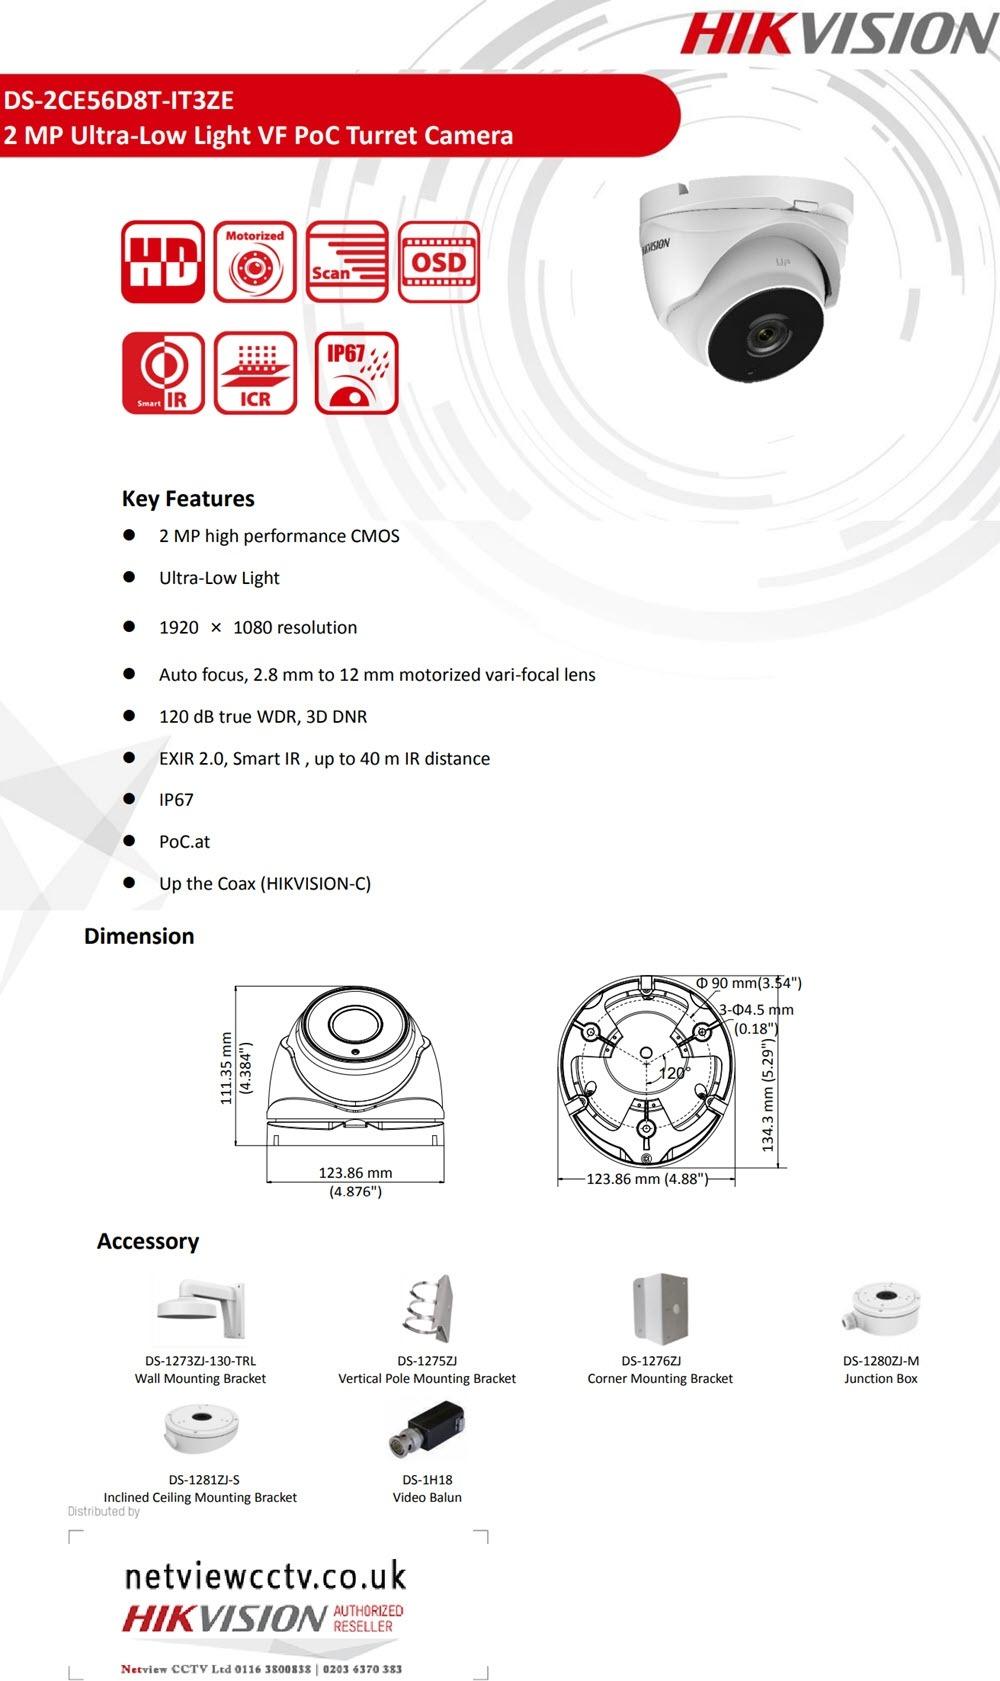 2MP Hikvision DS-2CE56D8T-IT3ZE Ultra Low Light PoC Turret Dome Camera